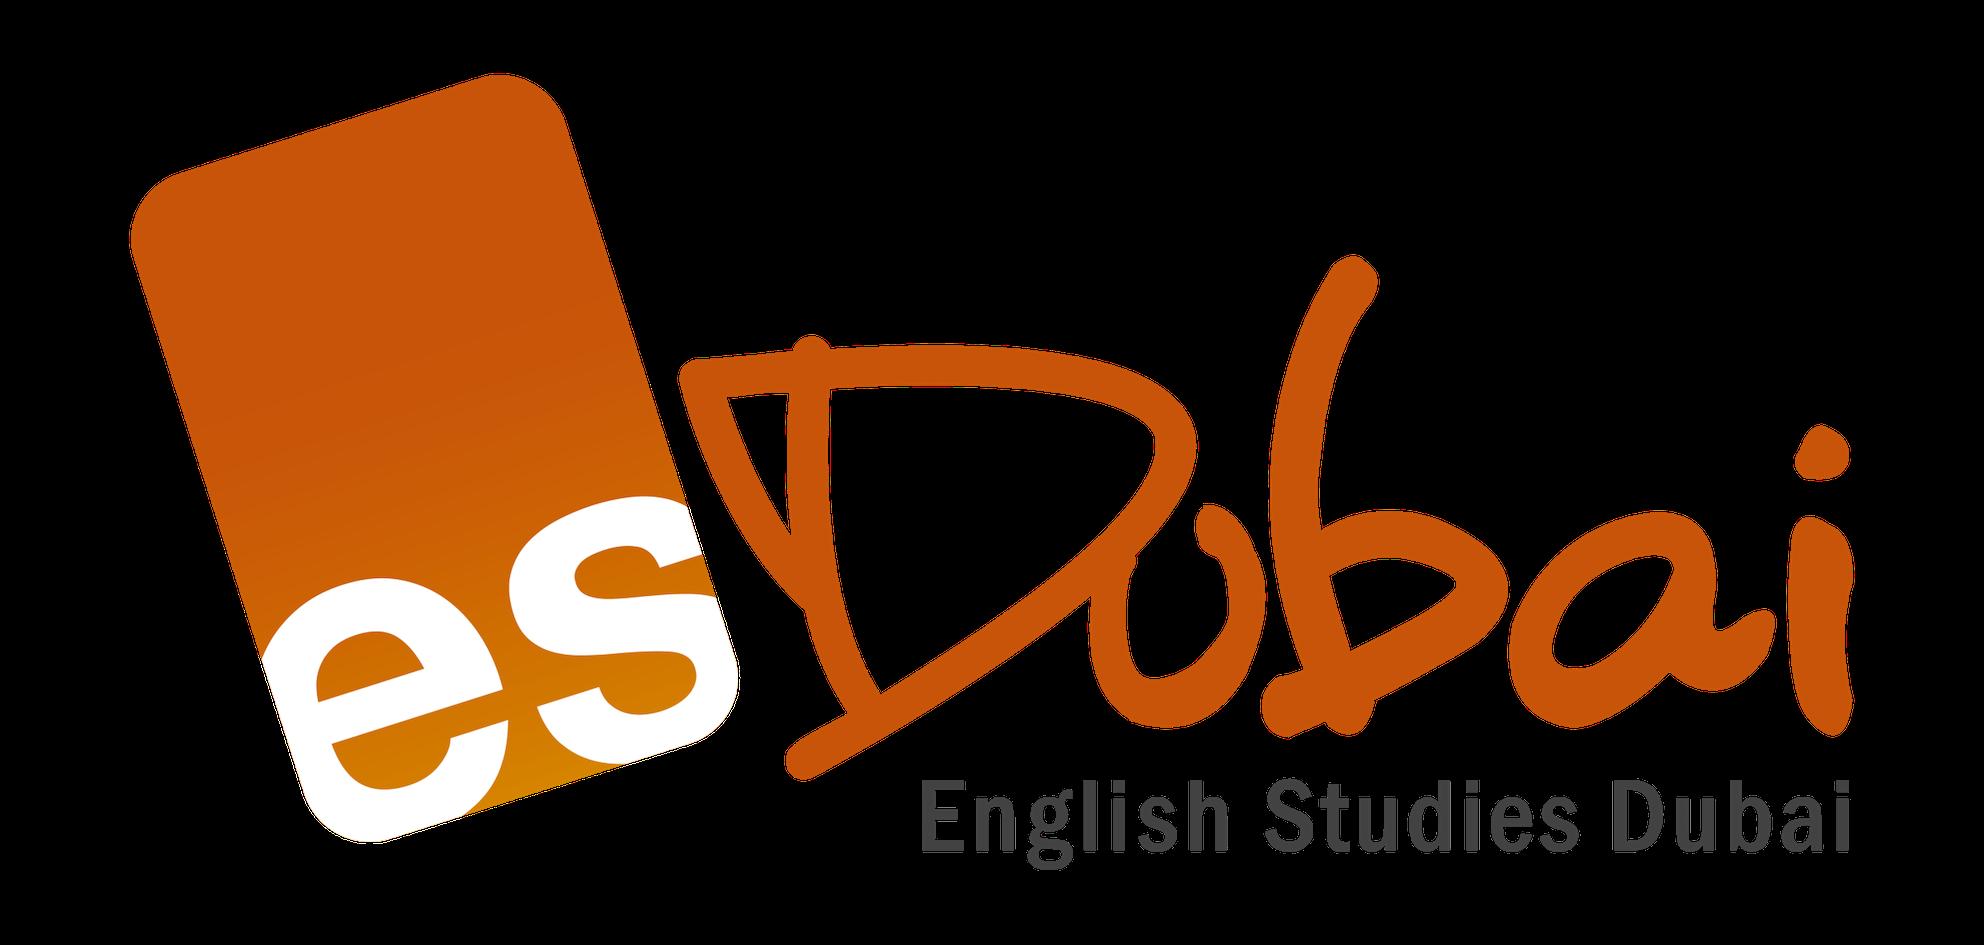 esdubai-logo